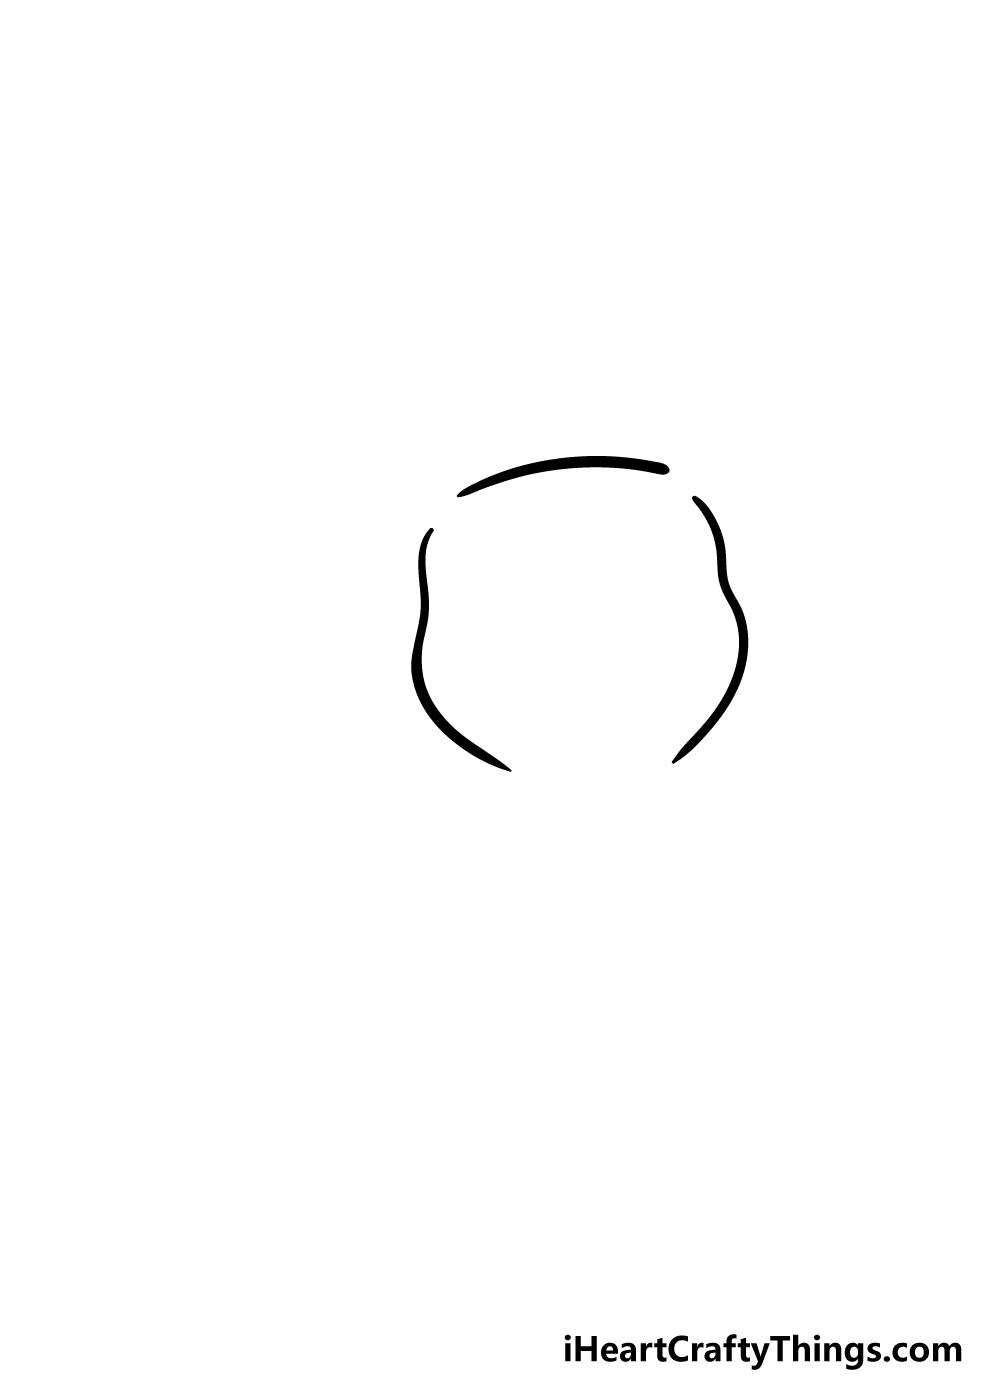 pikachu drawing step 1